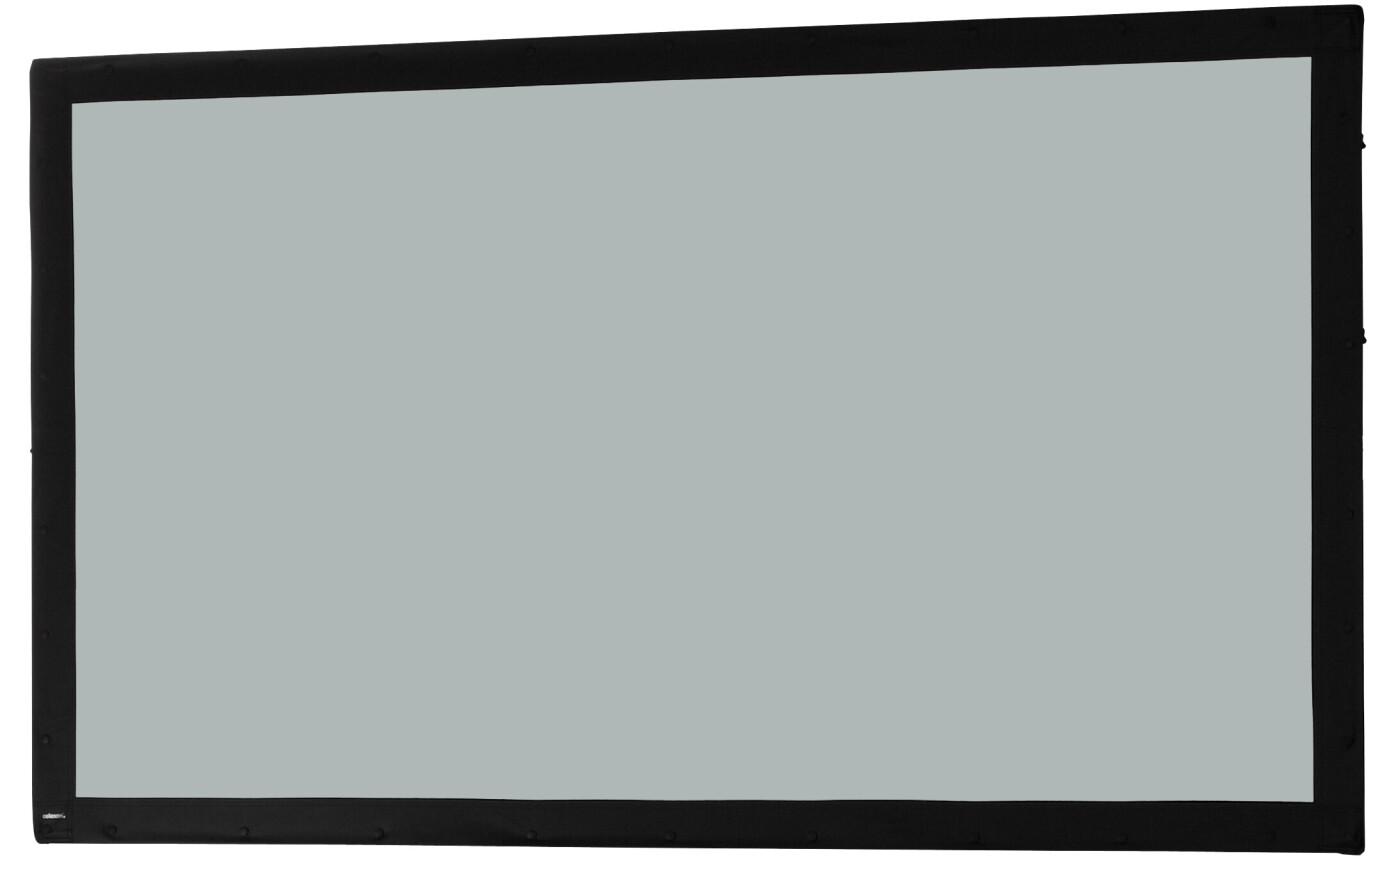 celexon Tuch für Faltrahmen Mobil Expert - 244 x 137 cm Rückprojektion